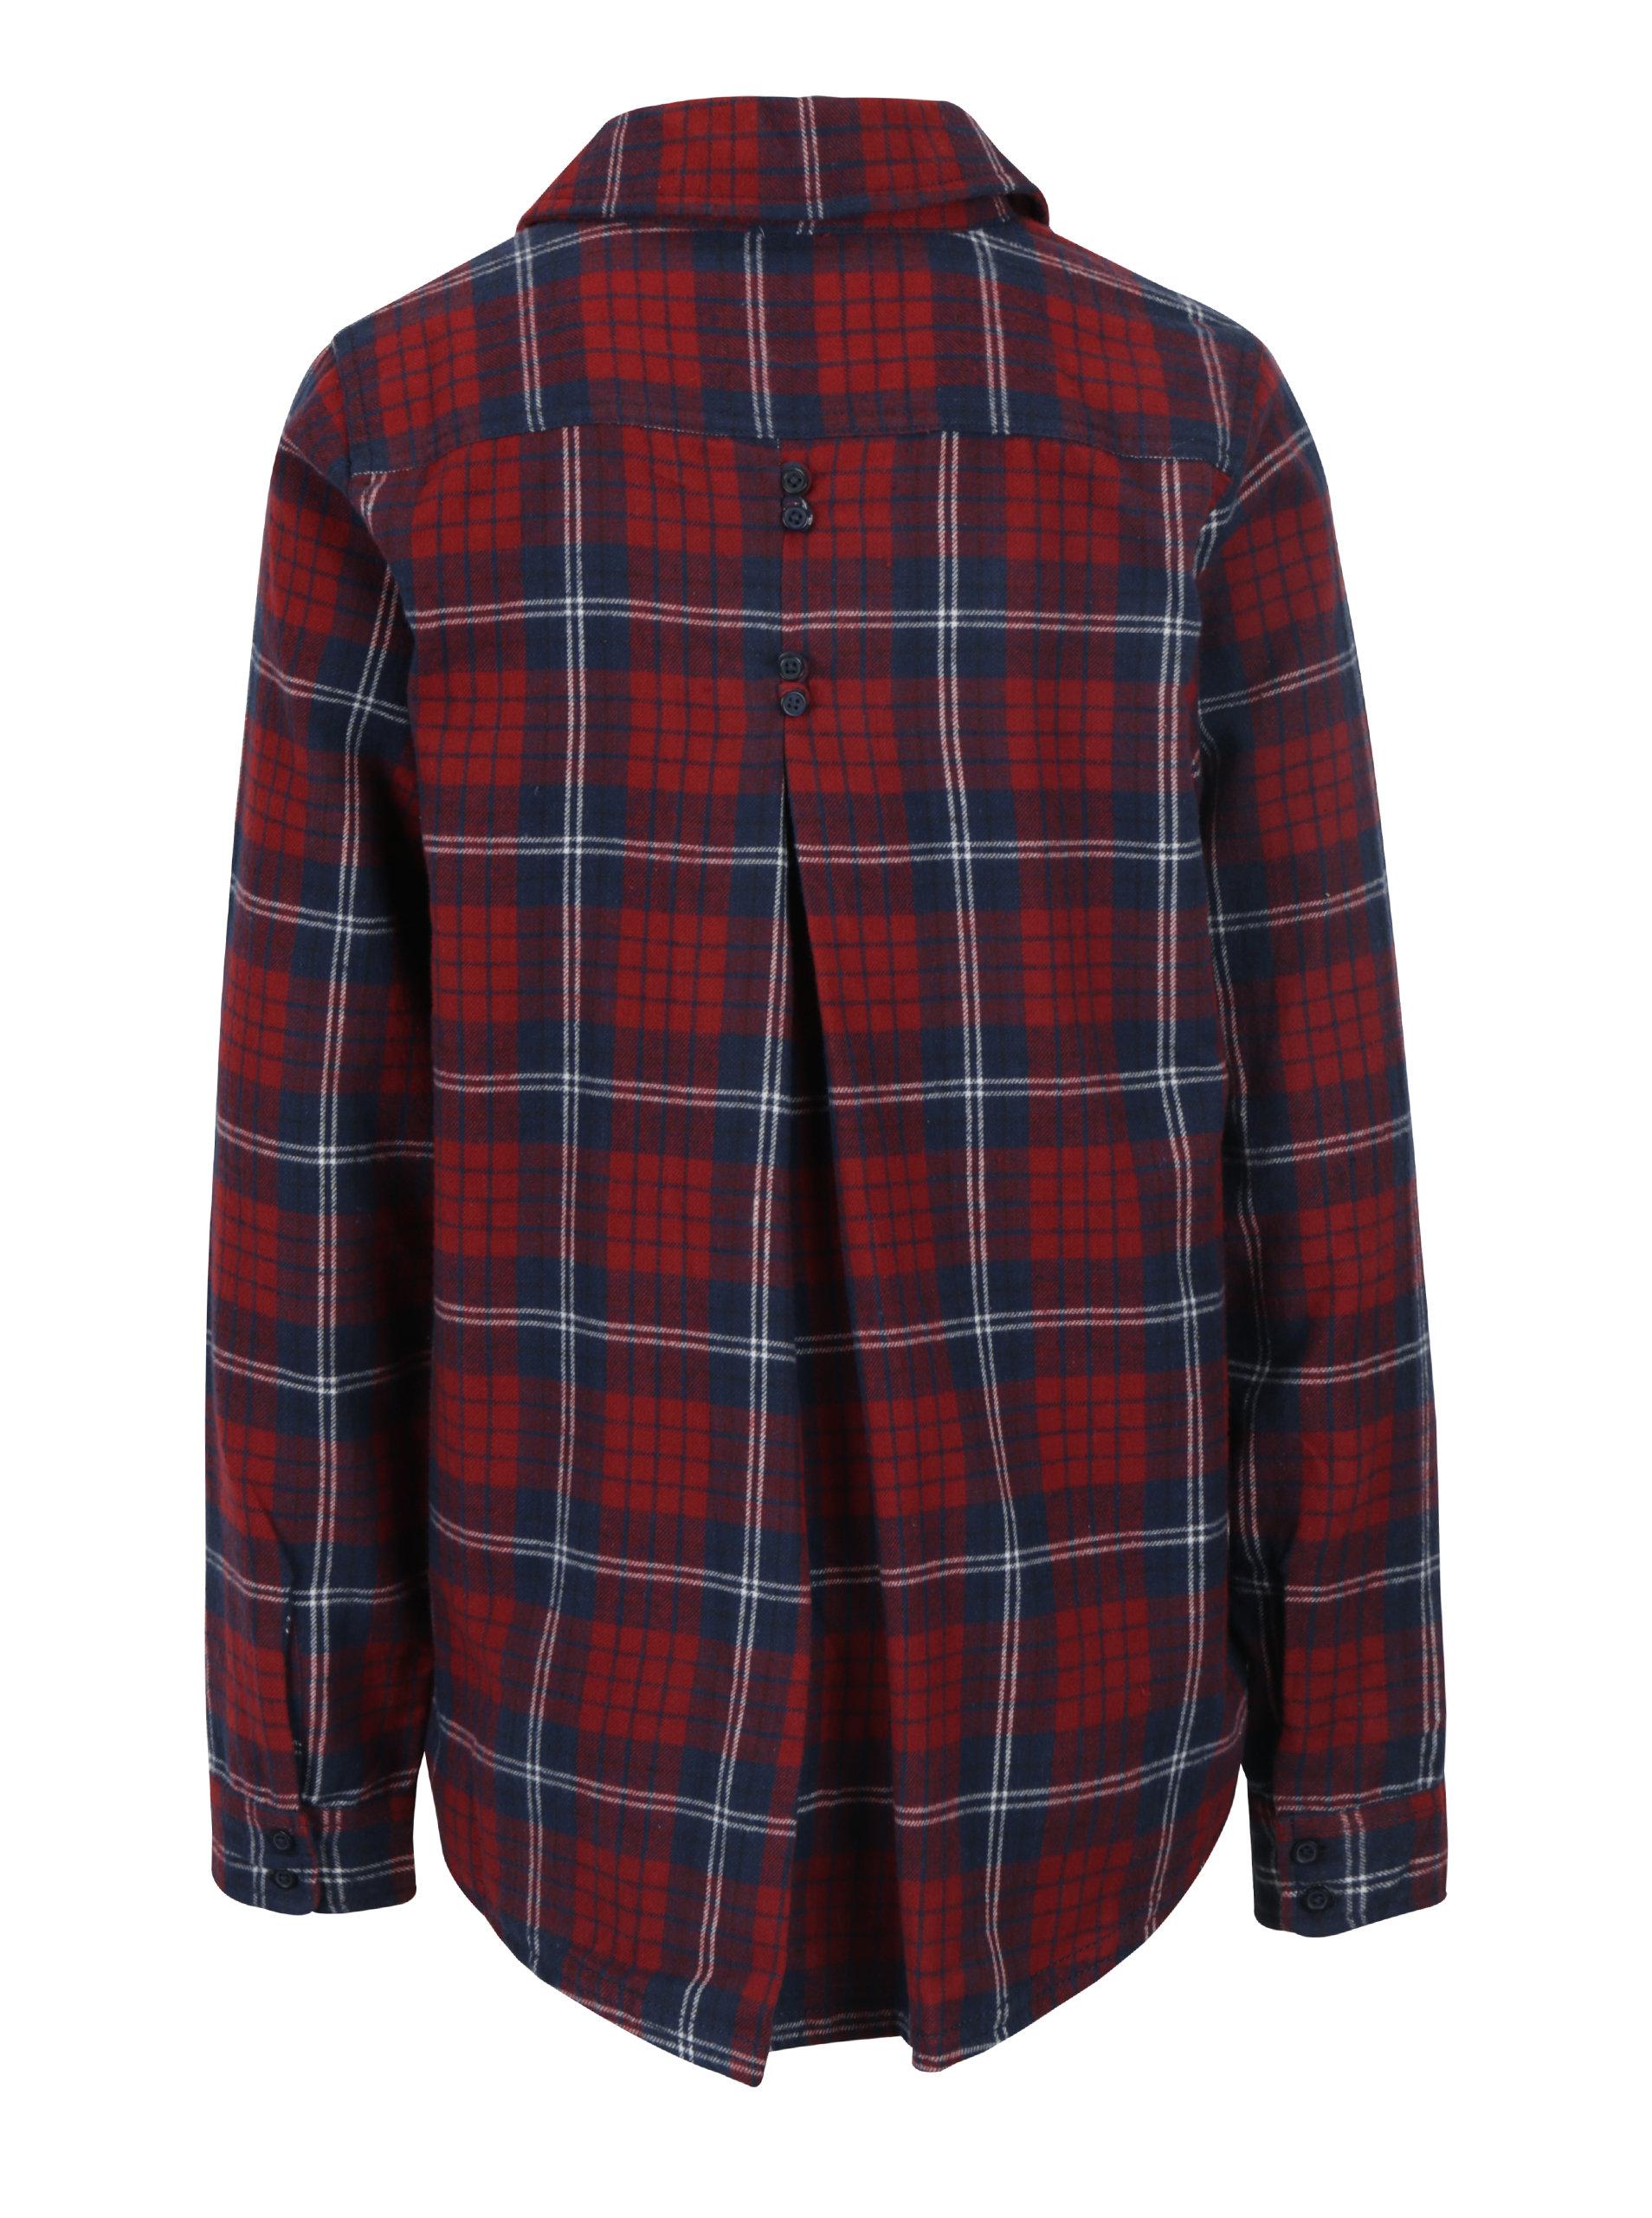 50f34f9d3c65 Modro-červená dámska károvaná košeľa Roxy Heavy Feeling ...